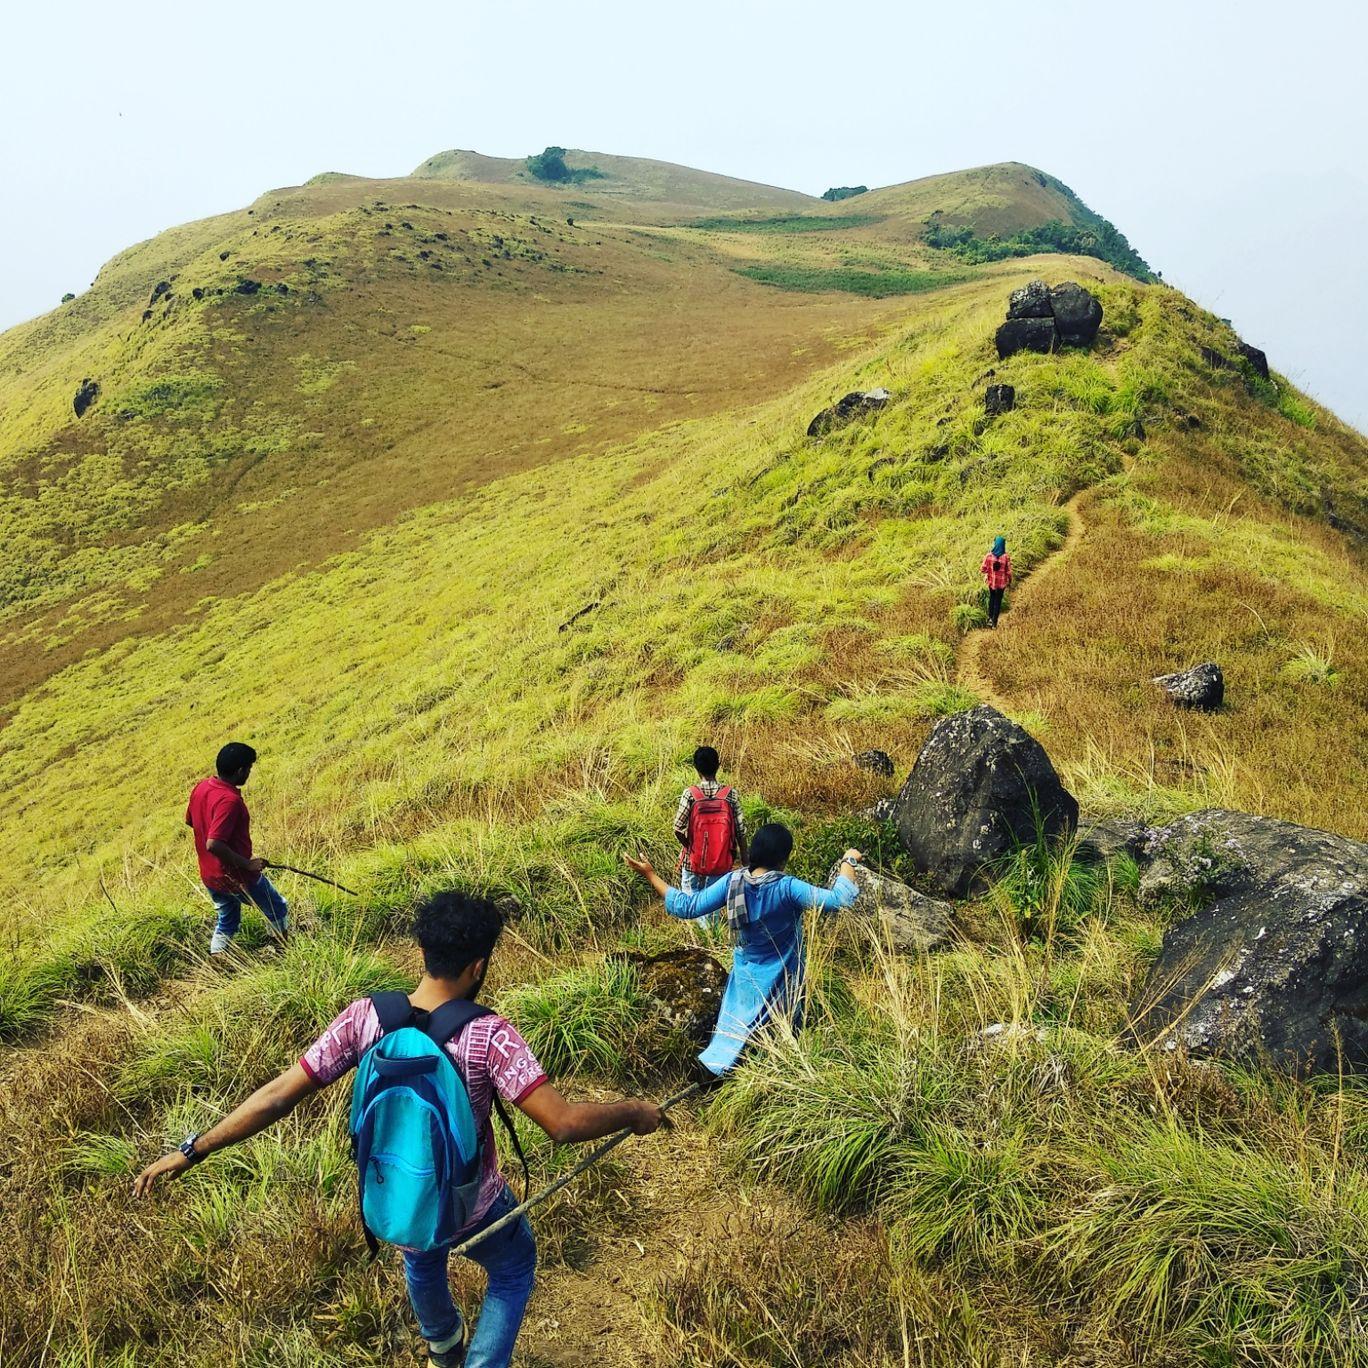 Photo of Paithal Mala By SarAng S